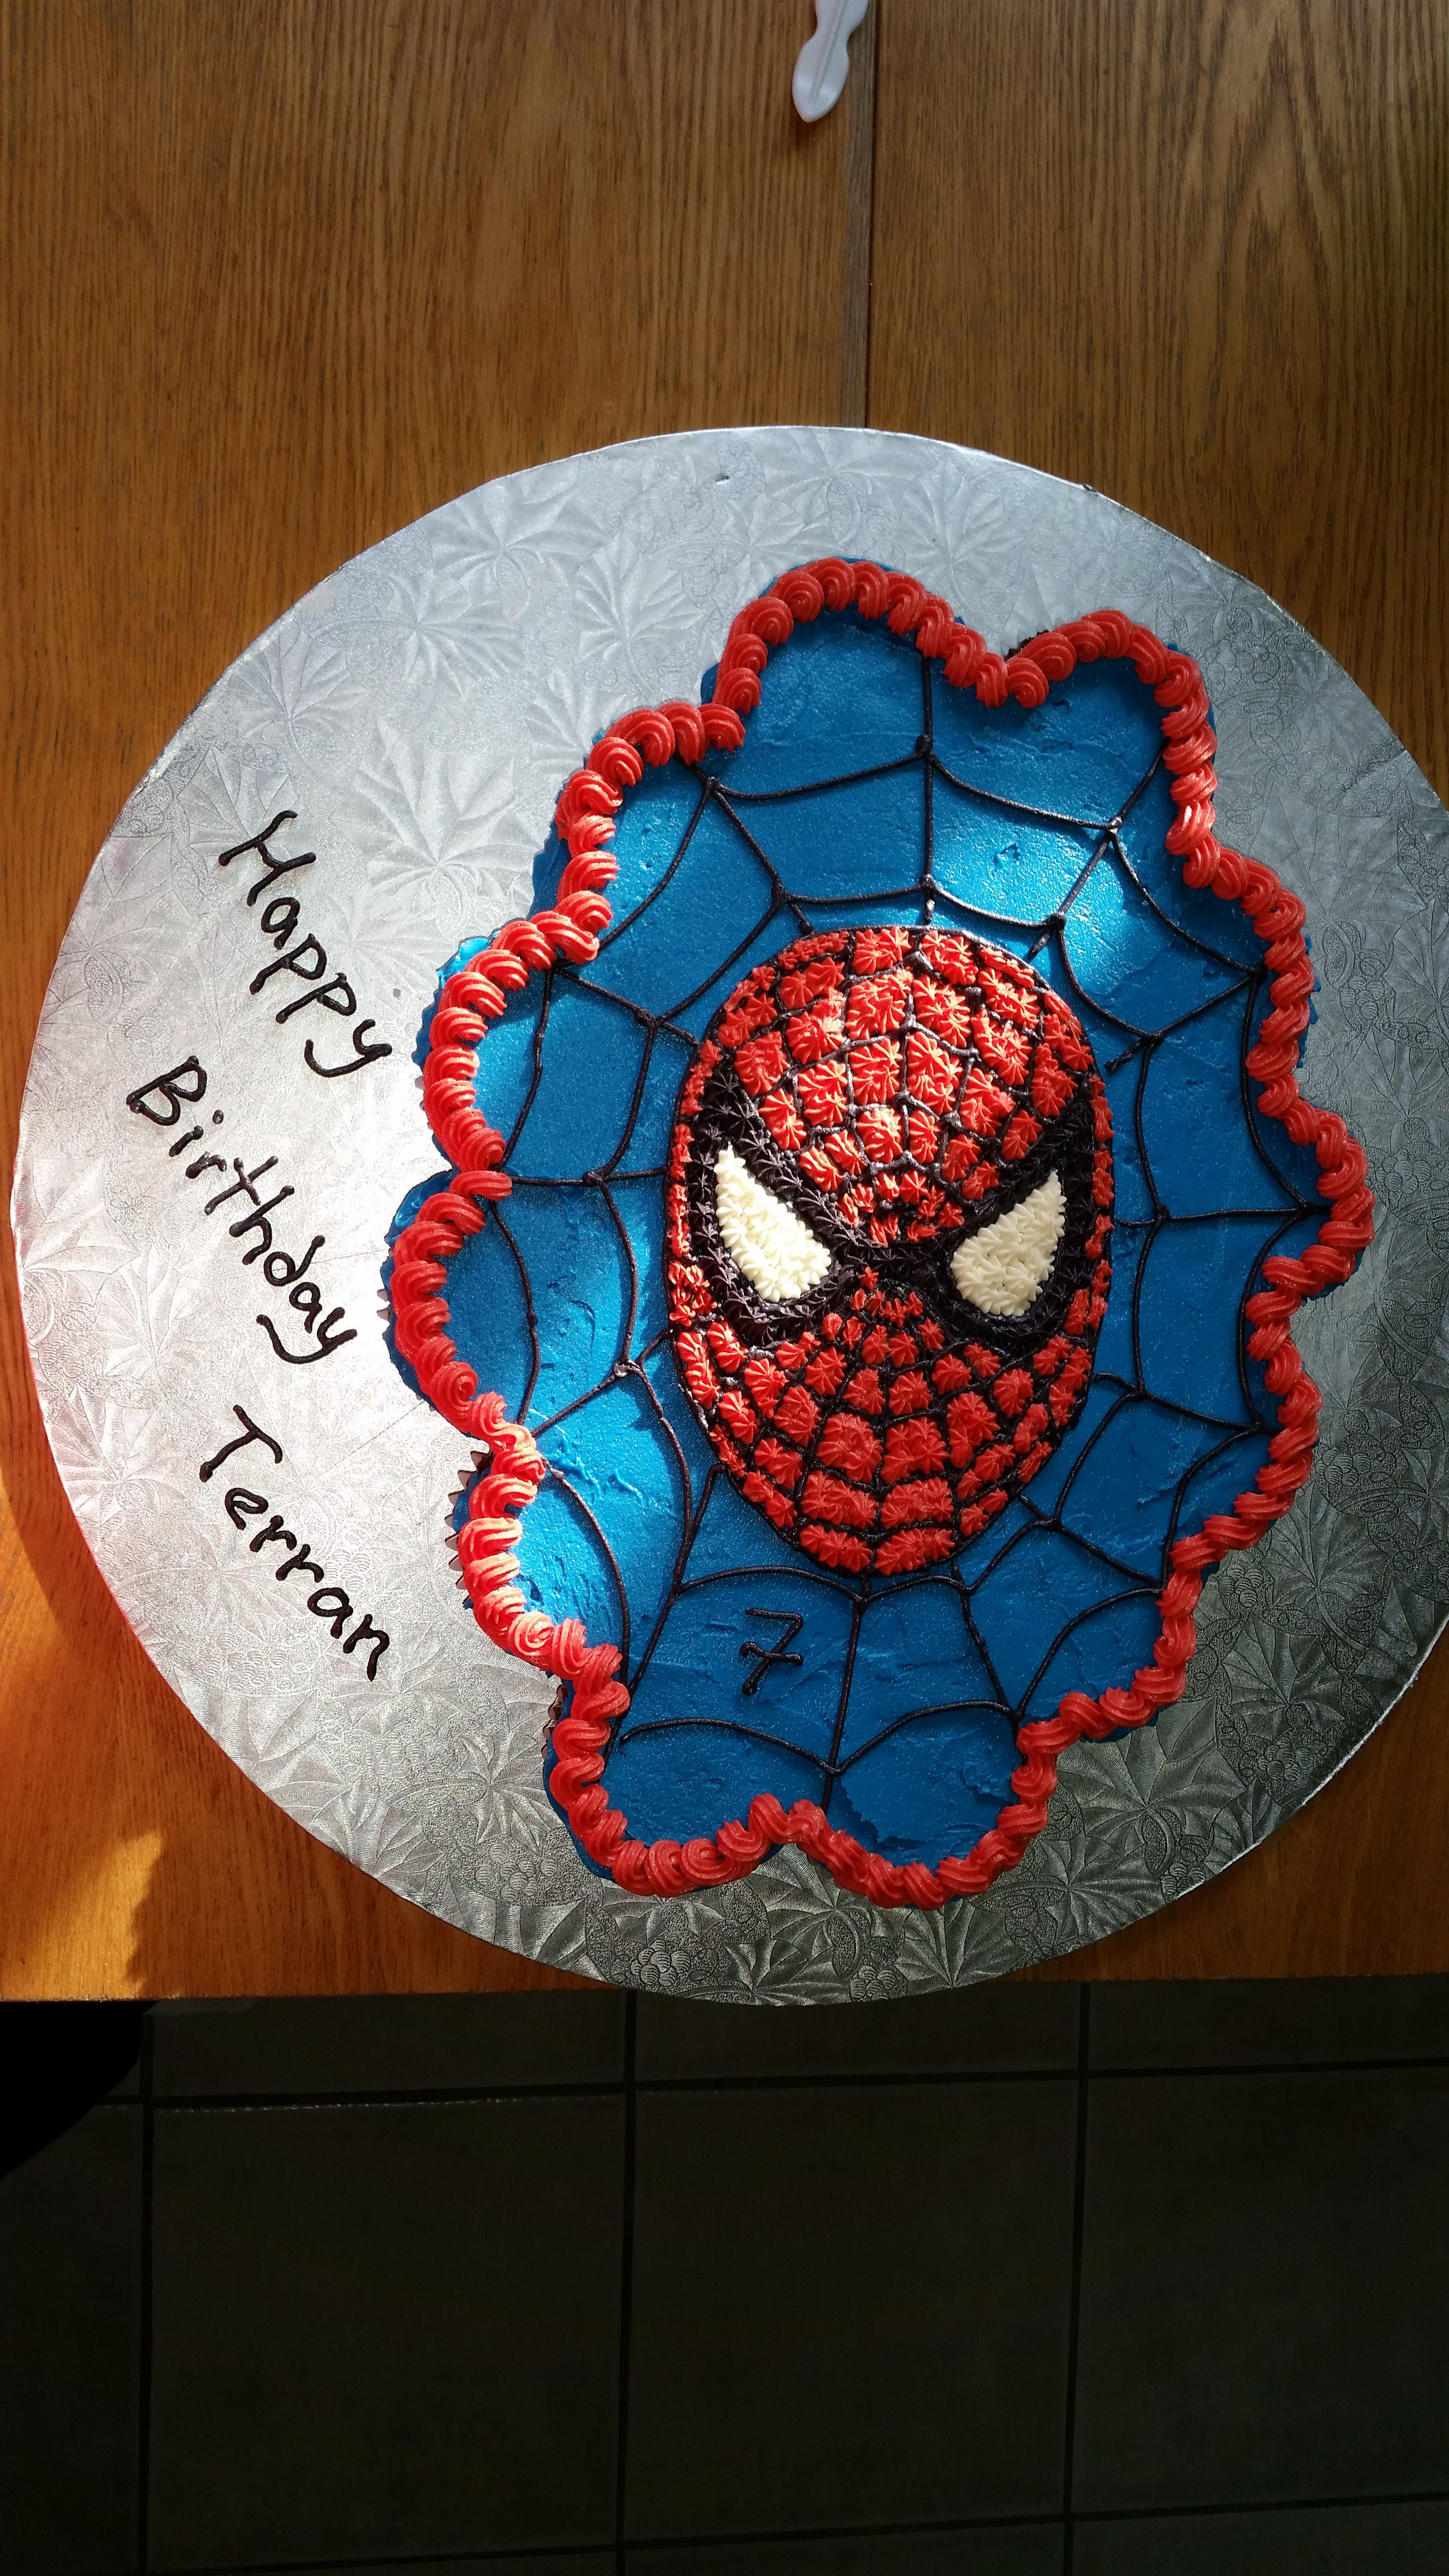 Spiderman Cupcake Cake In 2019 Spiderman Birthday Cake